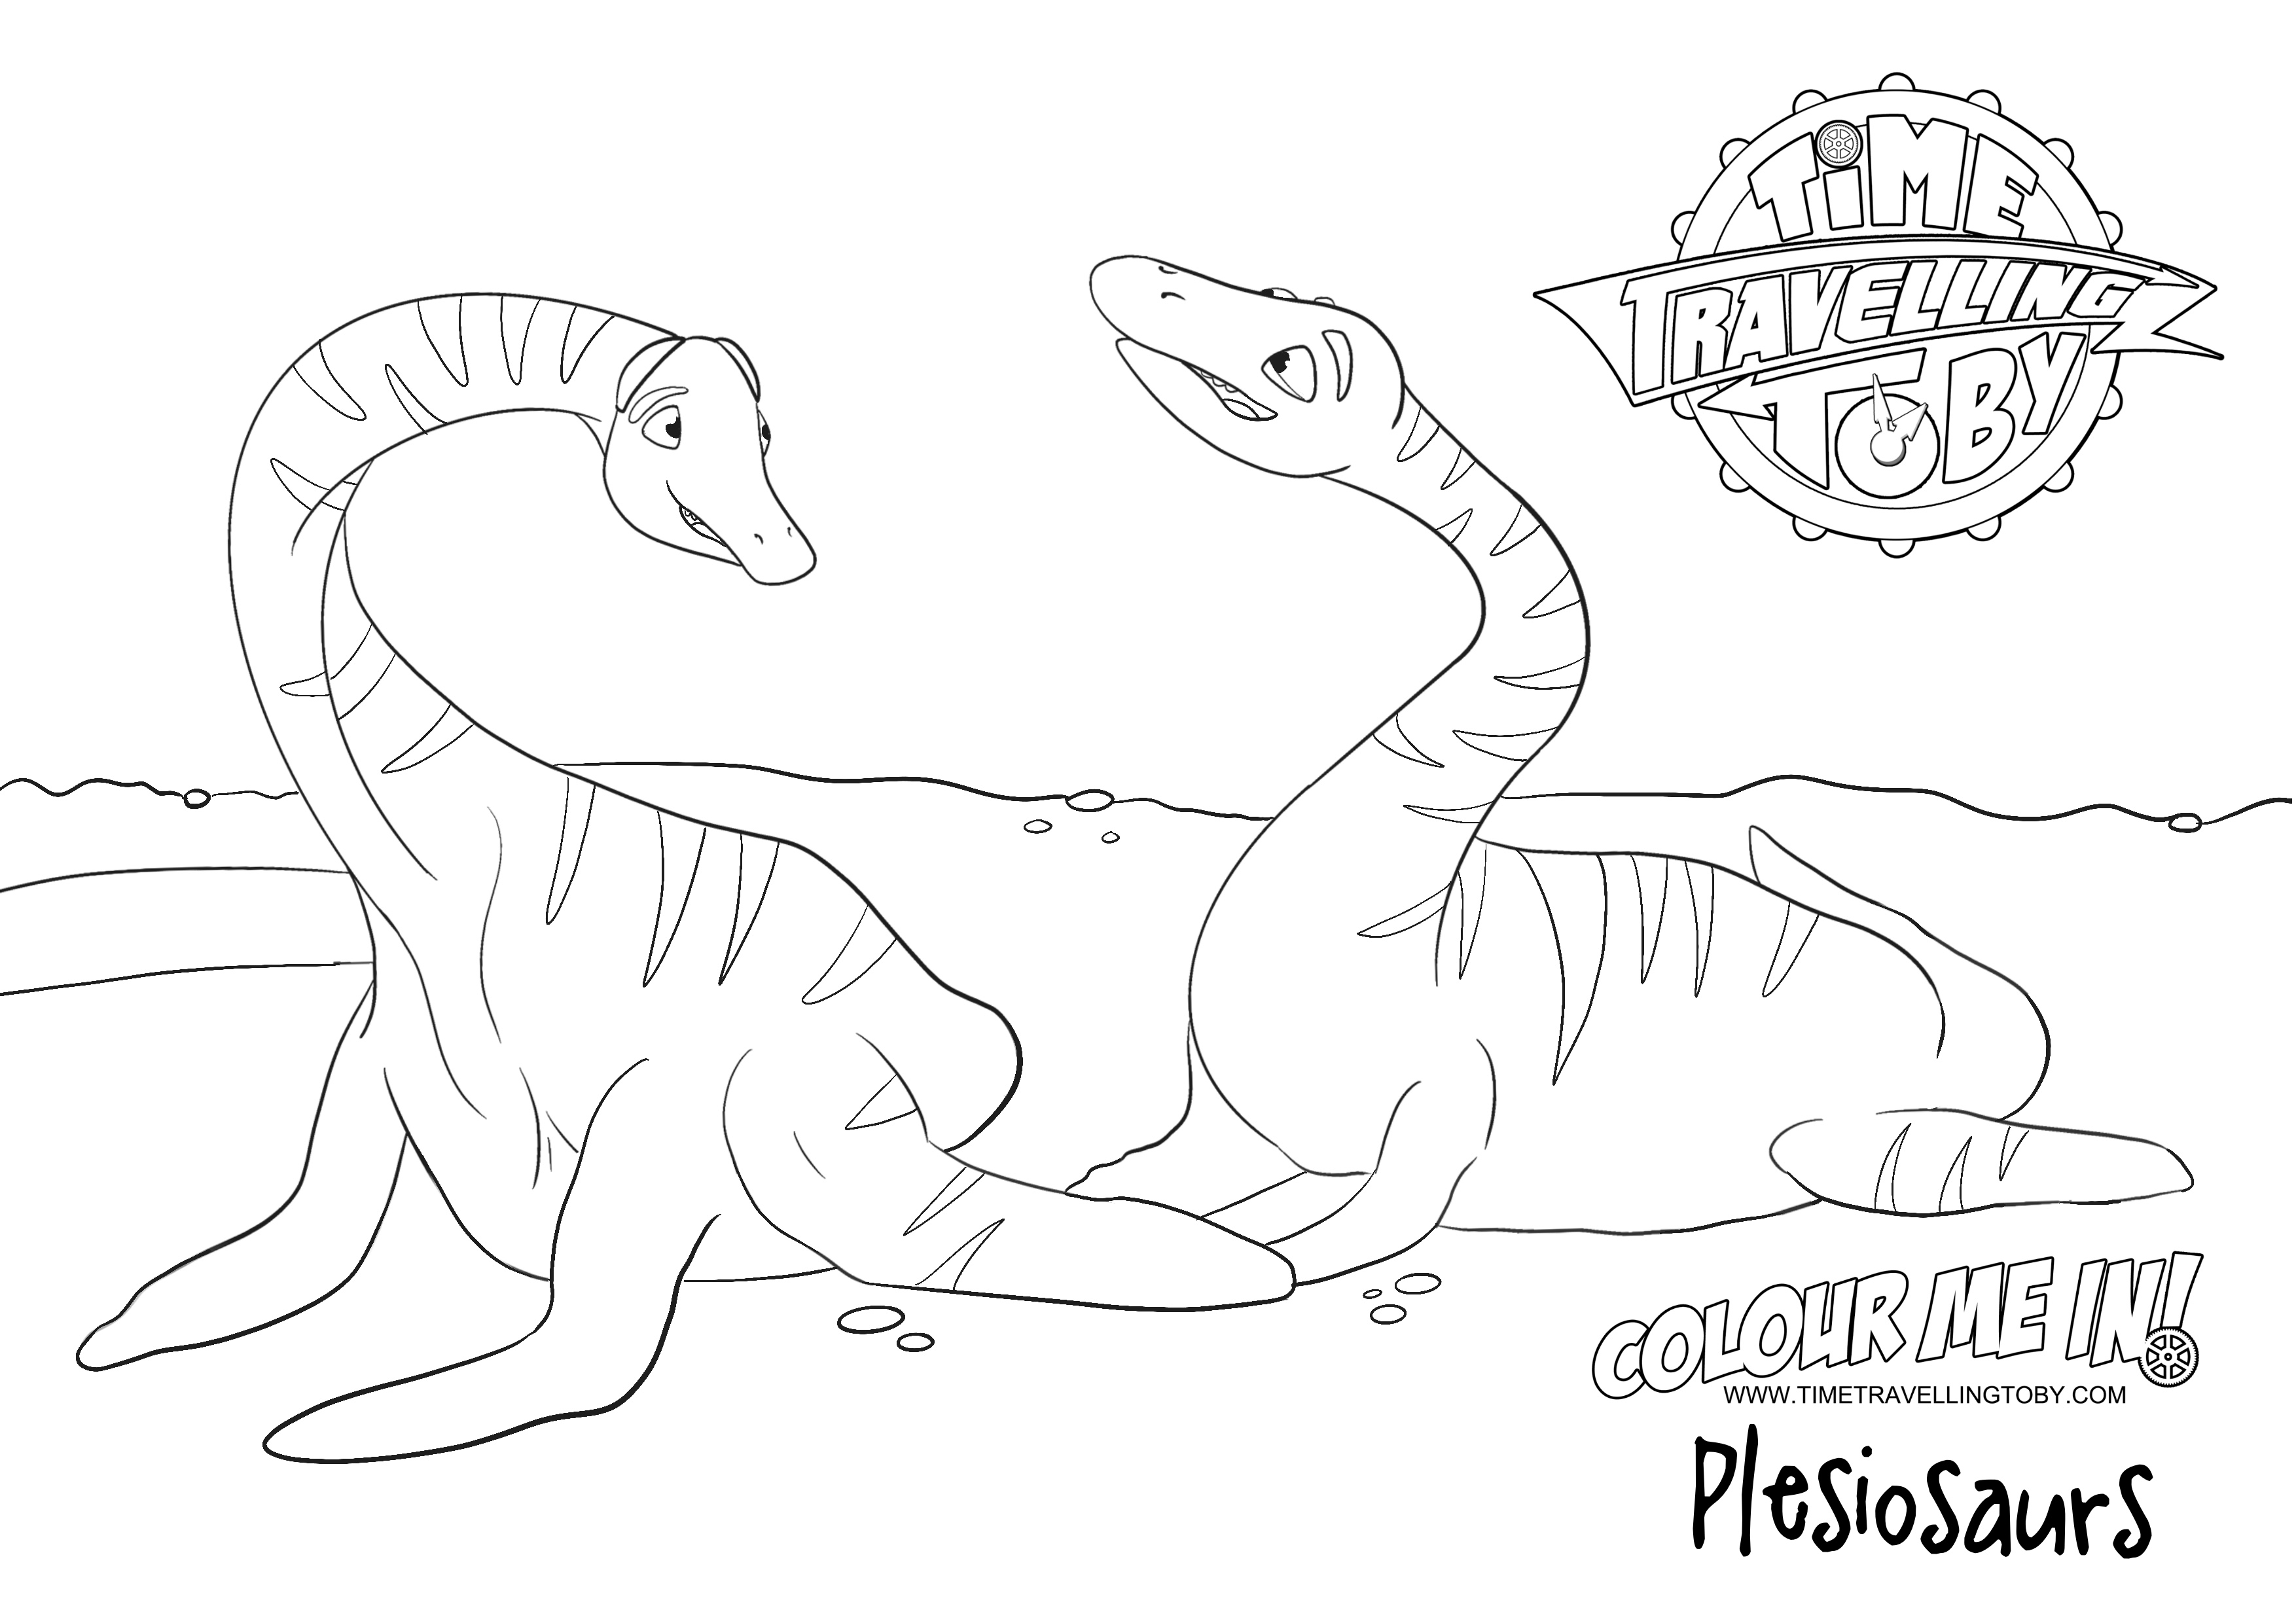 Colouring sheet Plesiosaurs